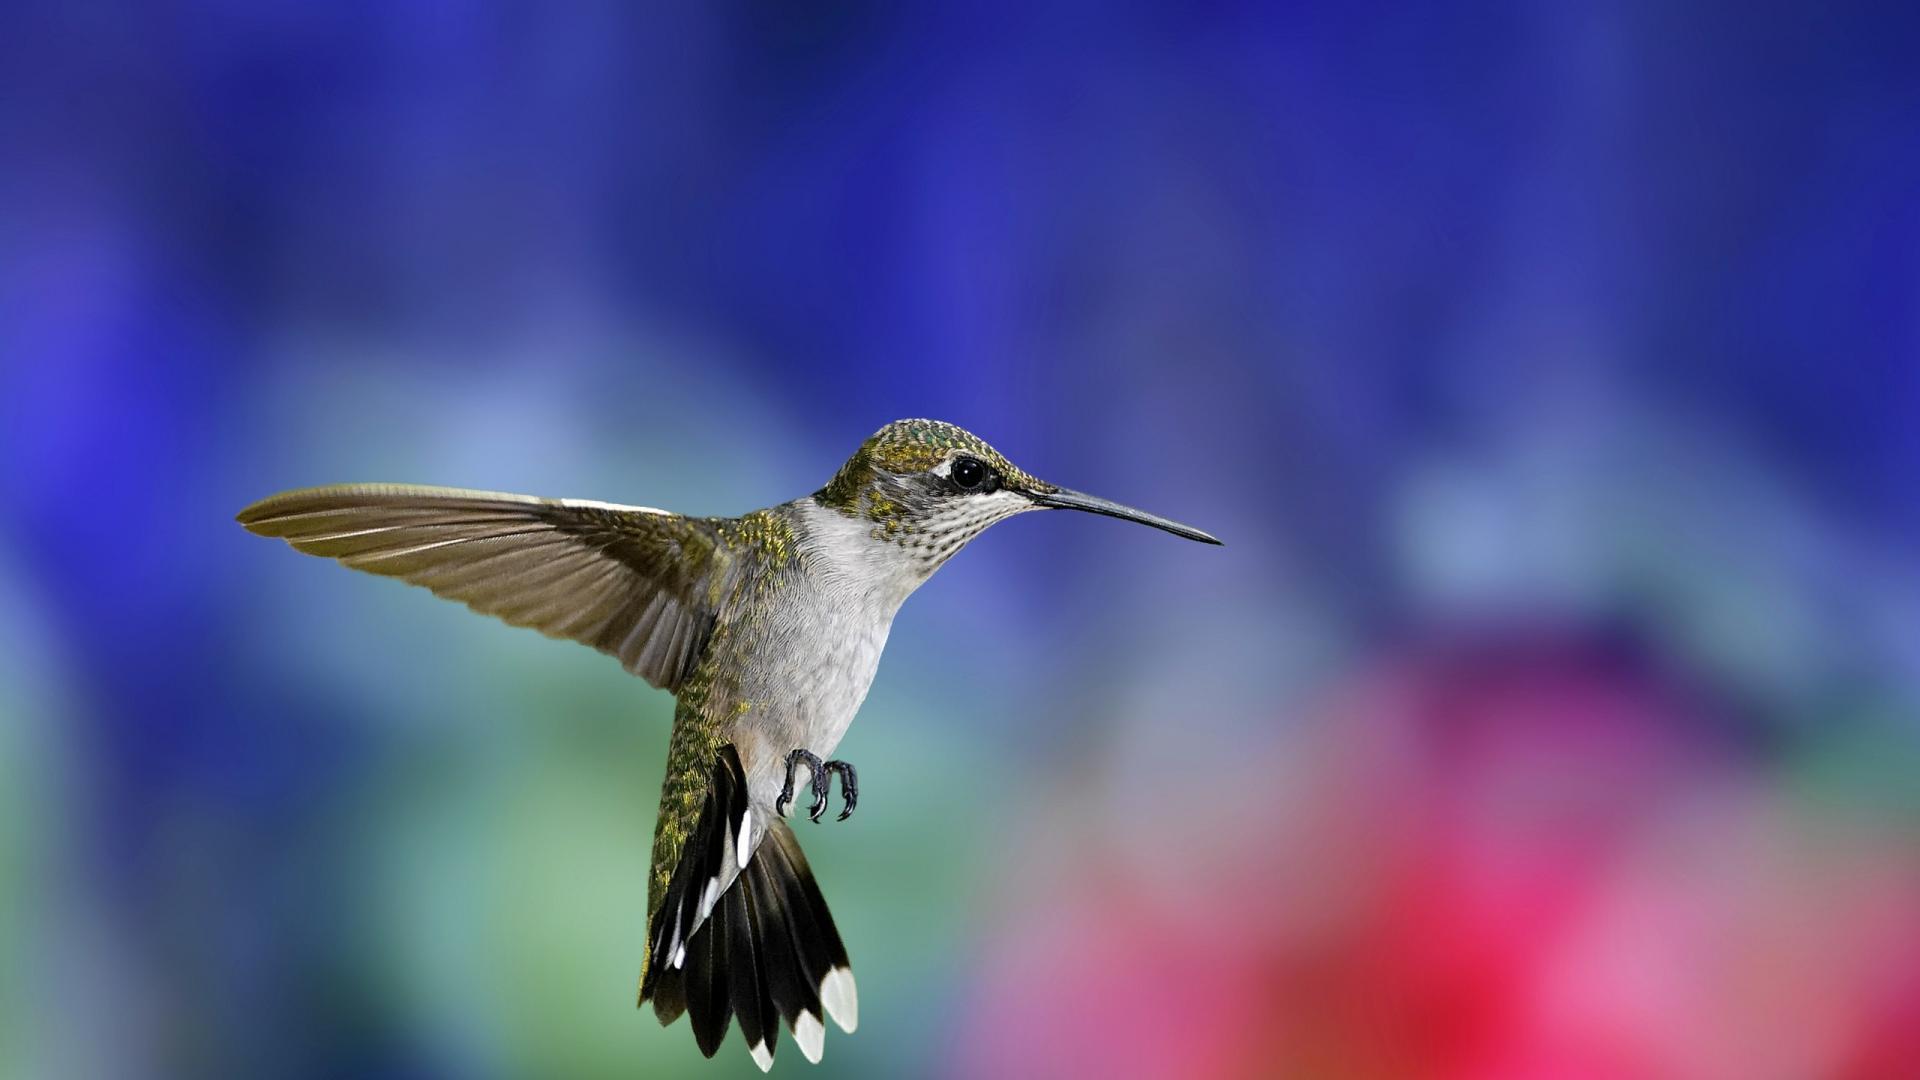 humming bird wallpapers wallpaper cave